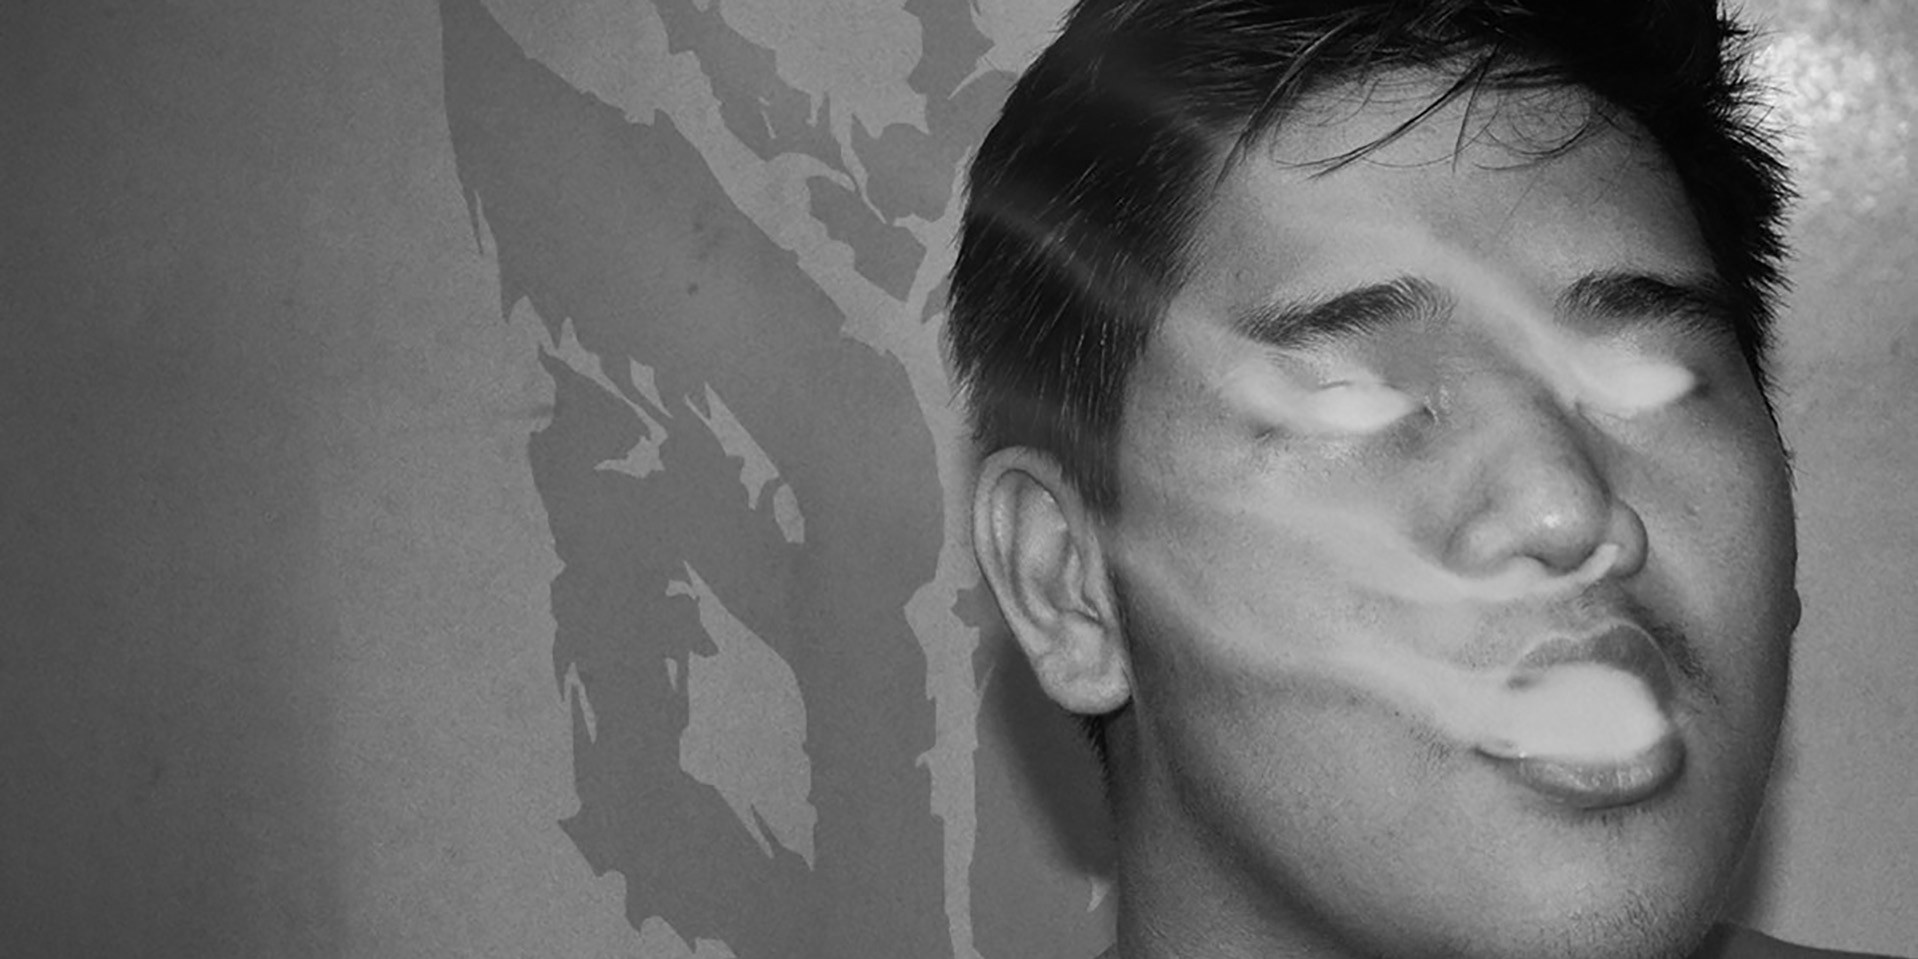 Bedroom producer Brandon Cueto debuts Countless Times EP – listen